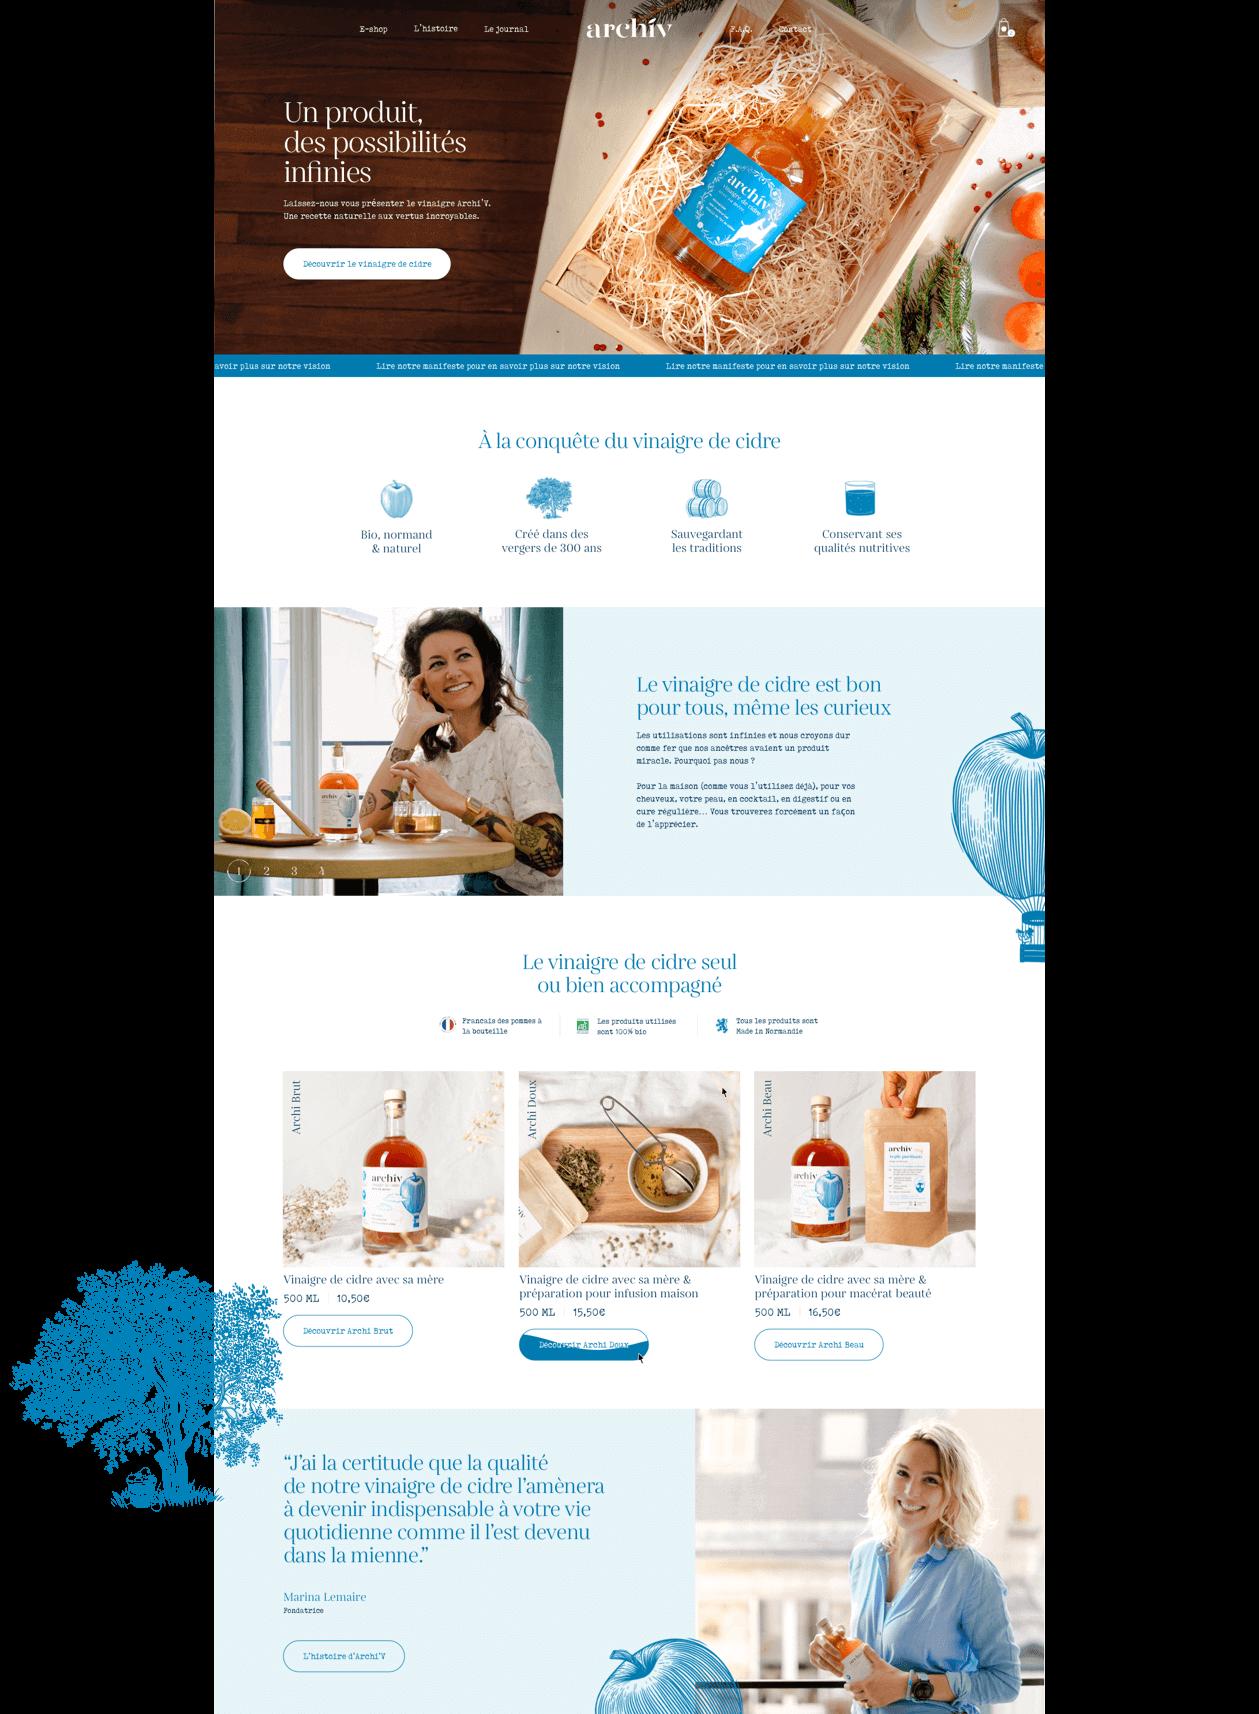 Site Web de la marque Archiv - 2